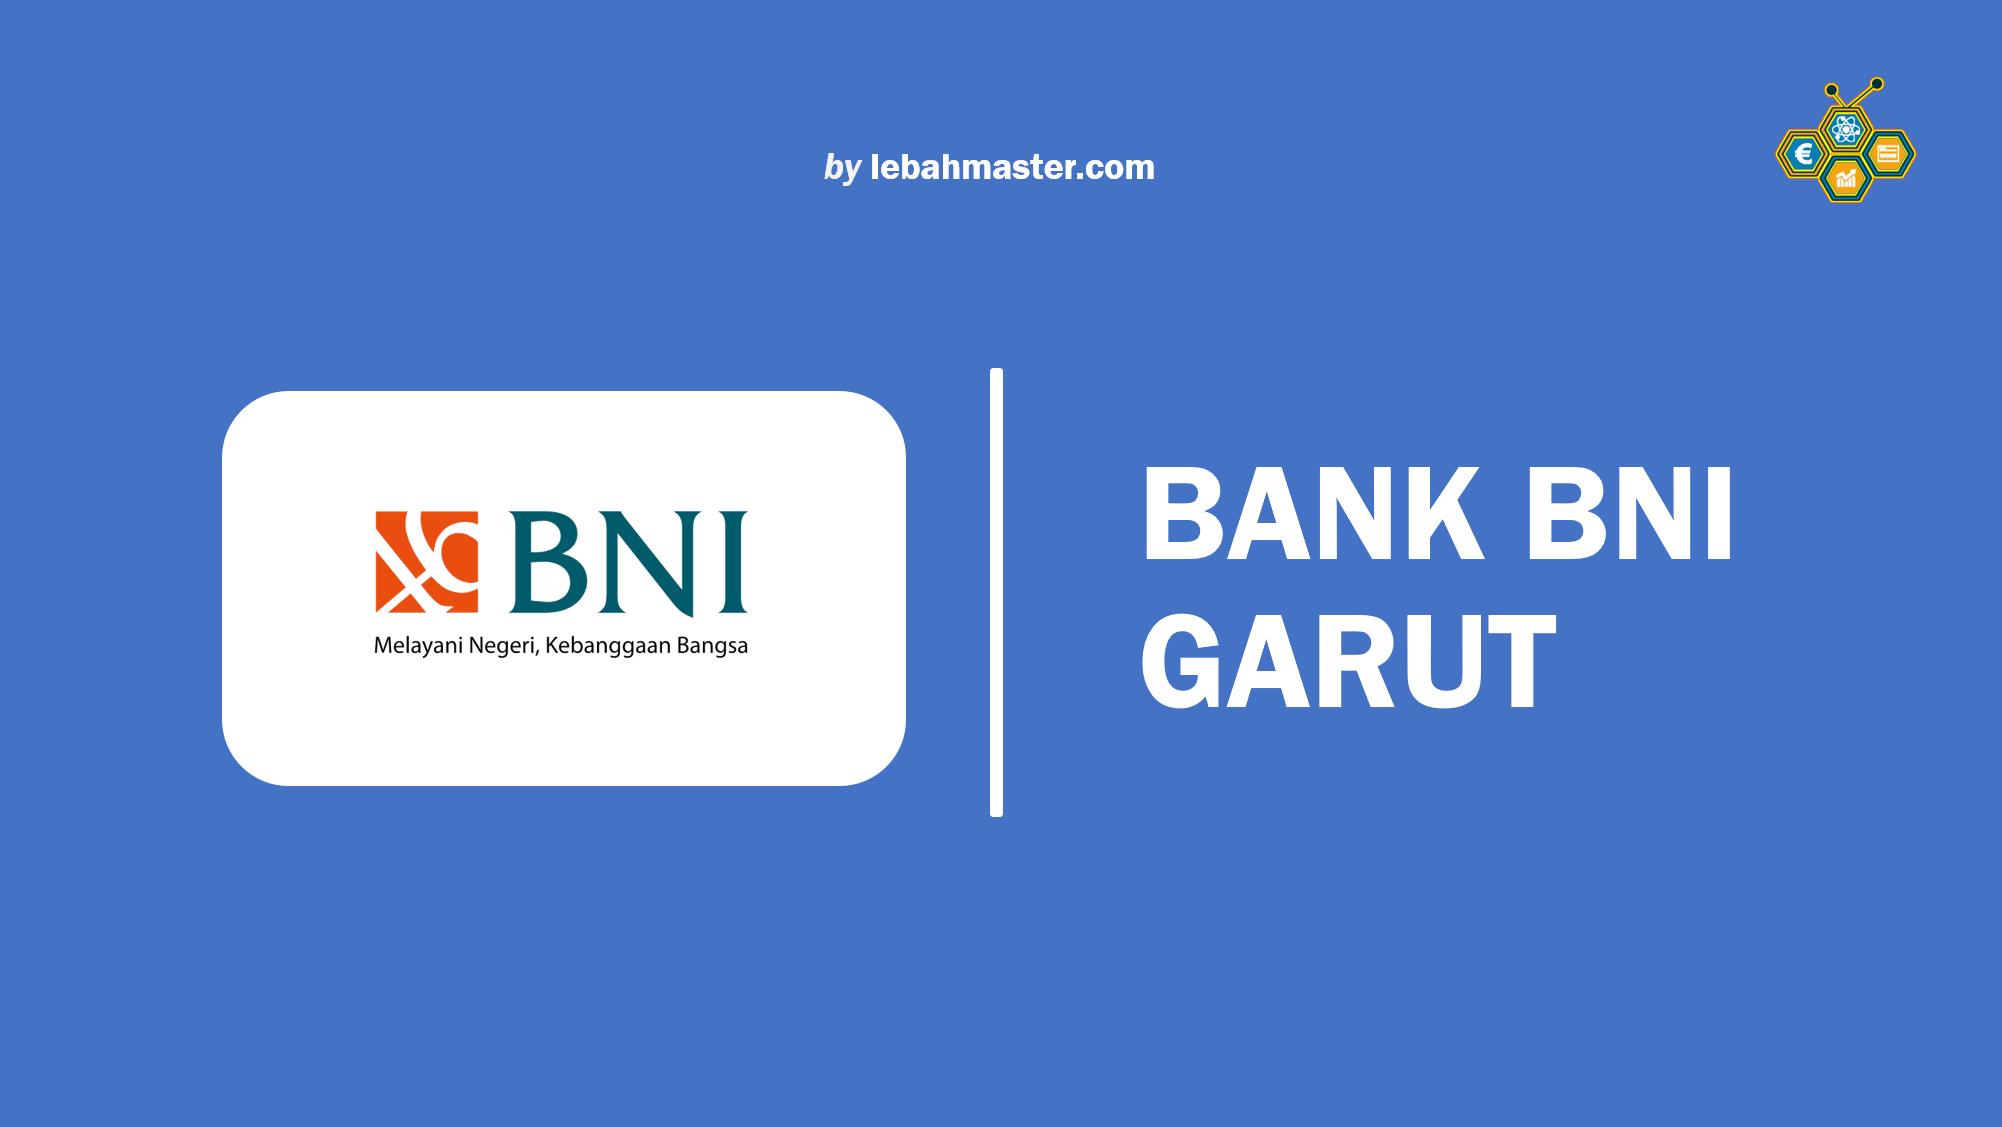 Bank BNI Garut